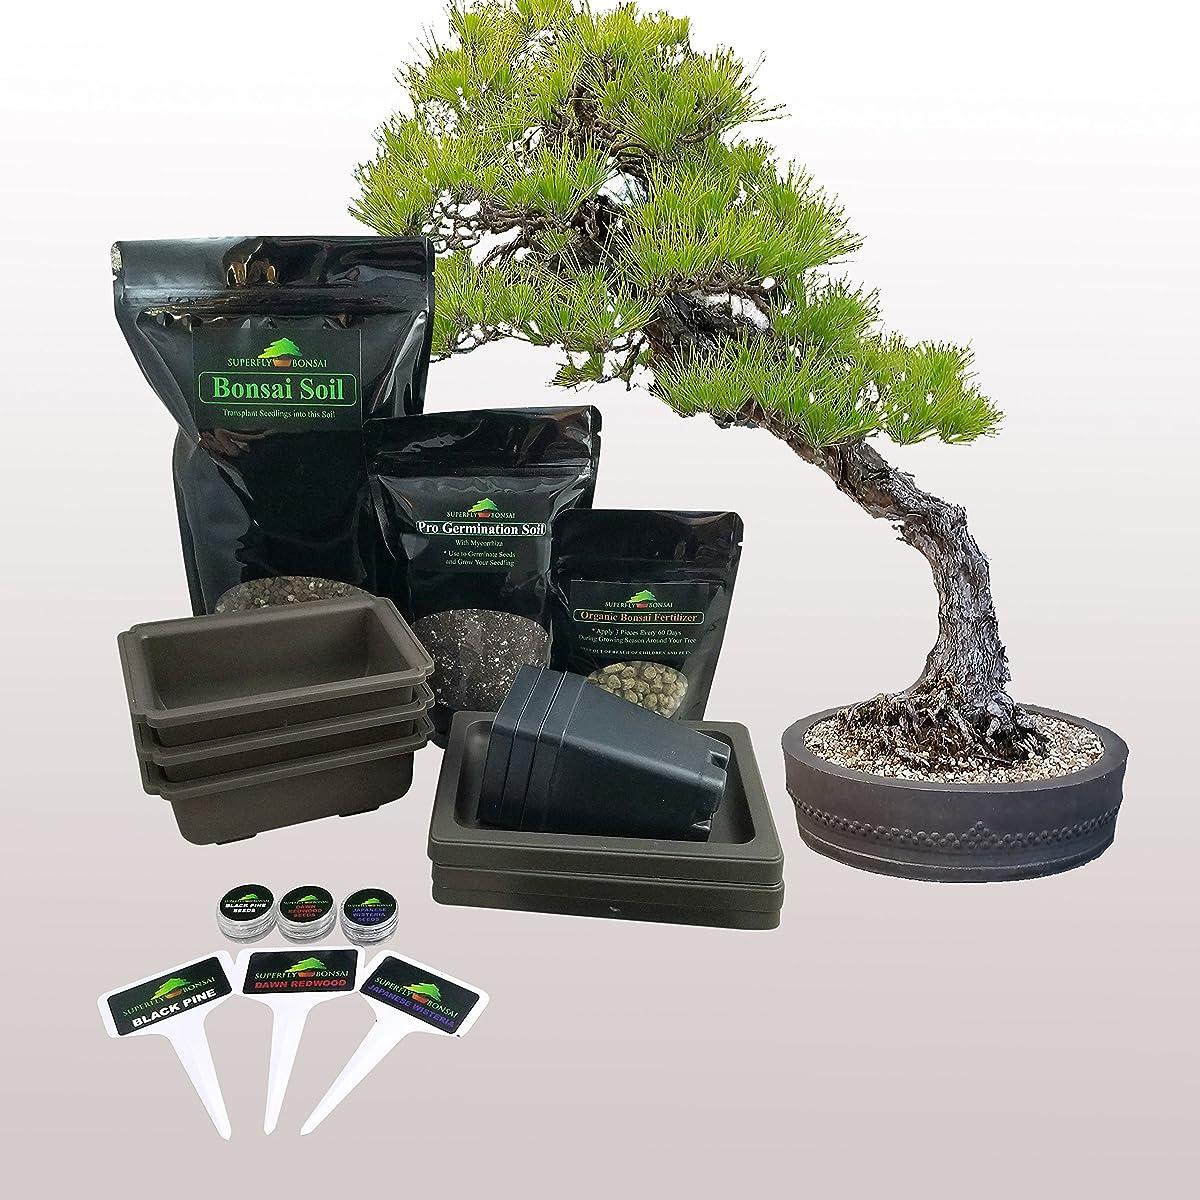 Premium Bonsai Tree Starter Seed Kit Japanese Black Pine, Japanese Wisteria, Dawn Redwood - with Bonsai Pots(Traditional Bonsai Kit)